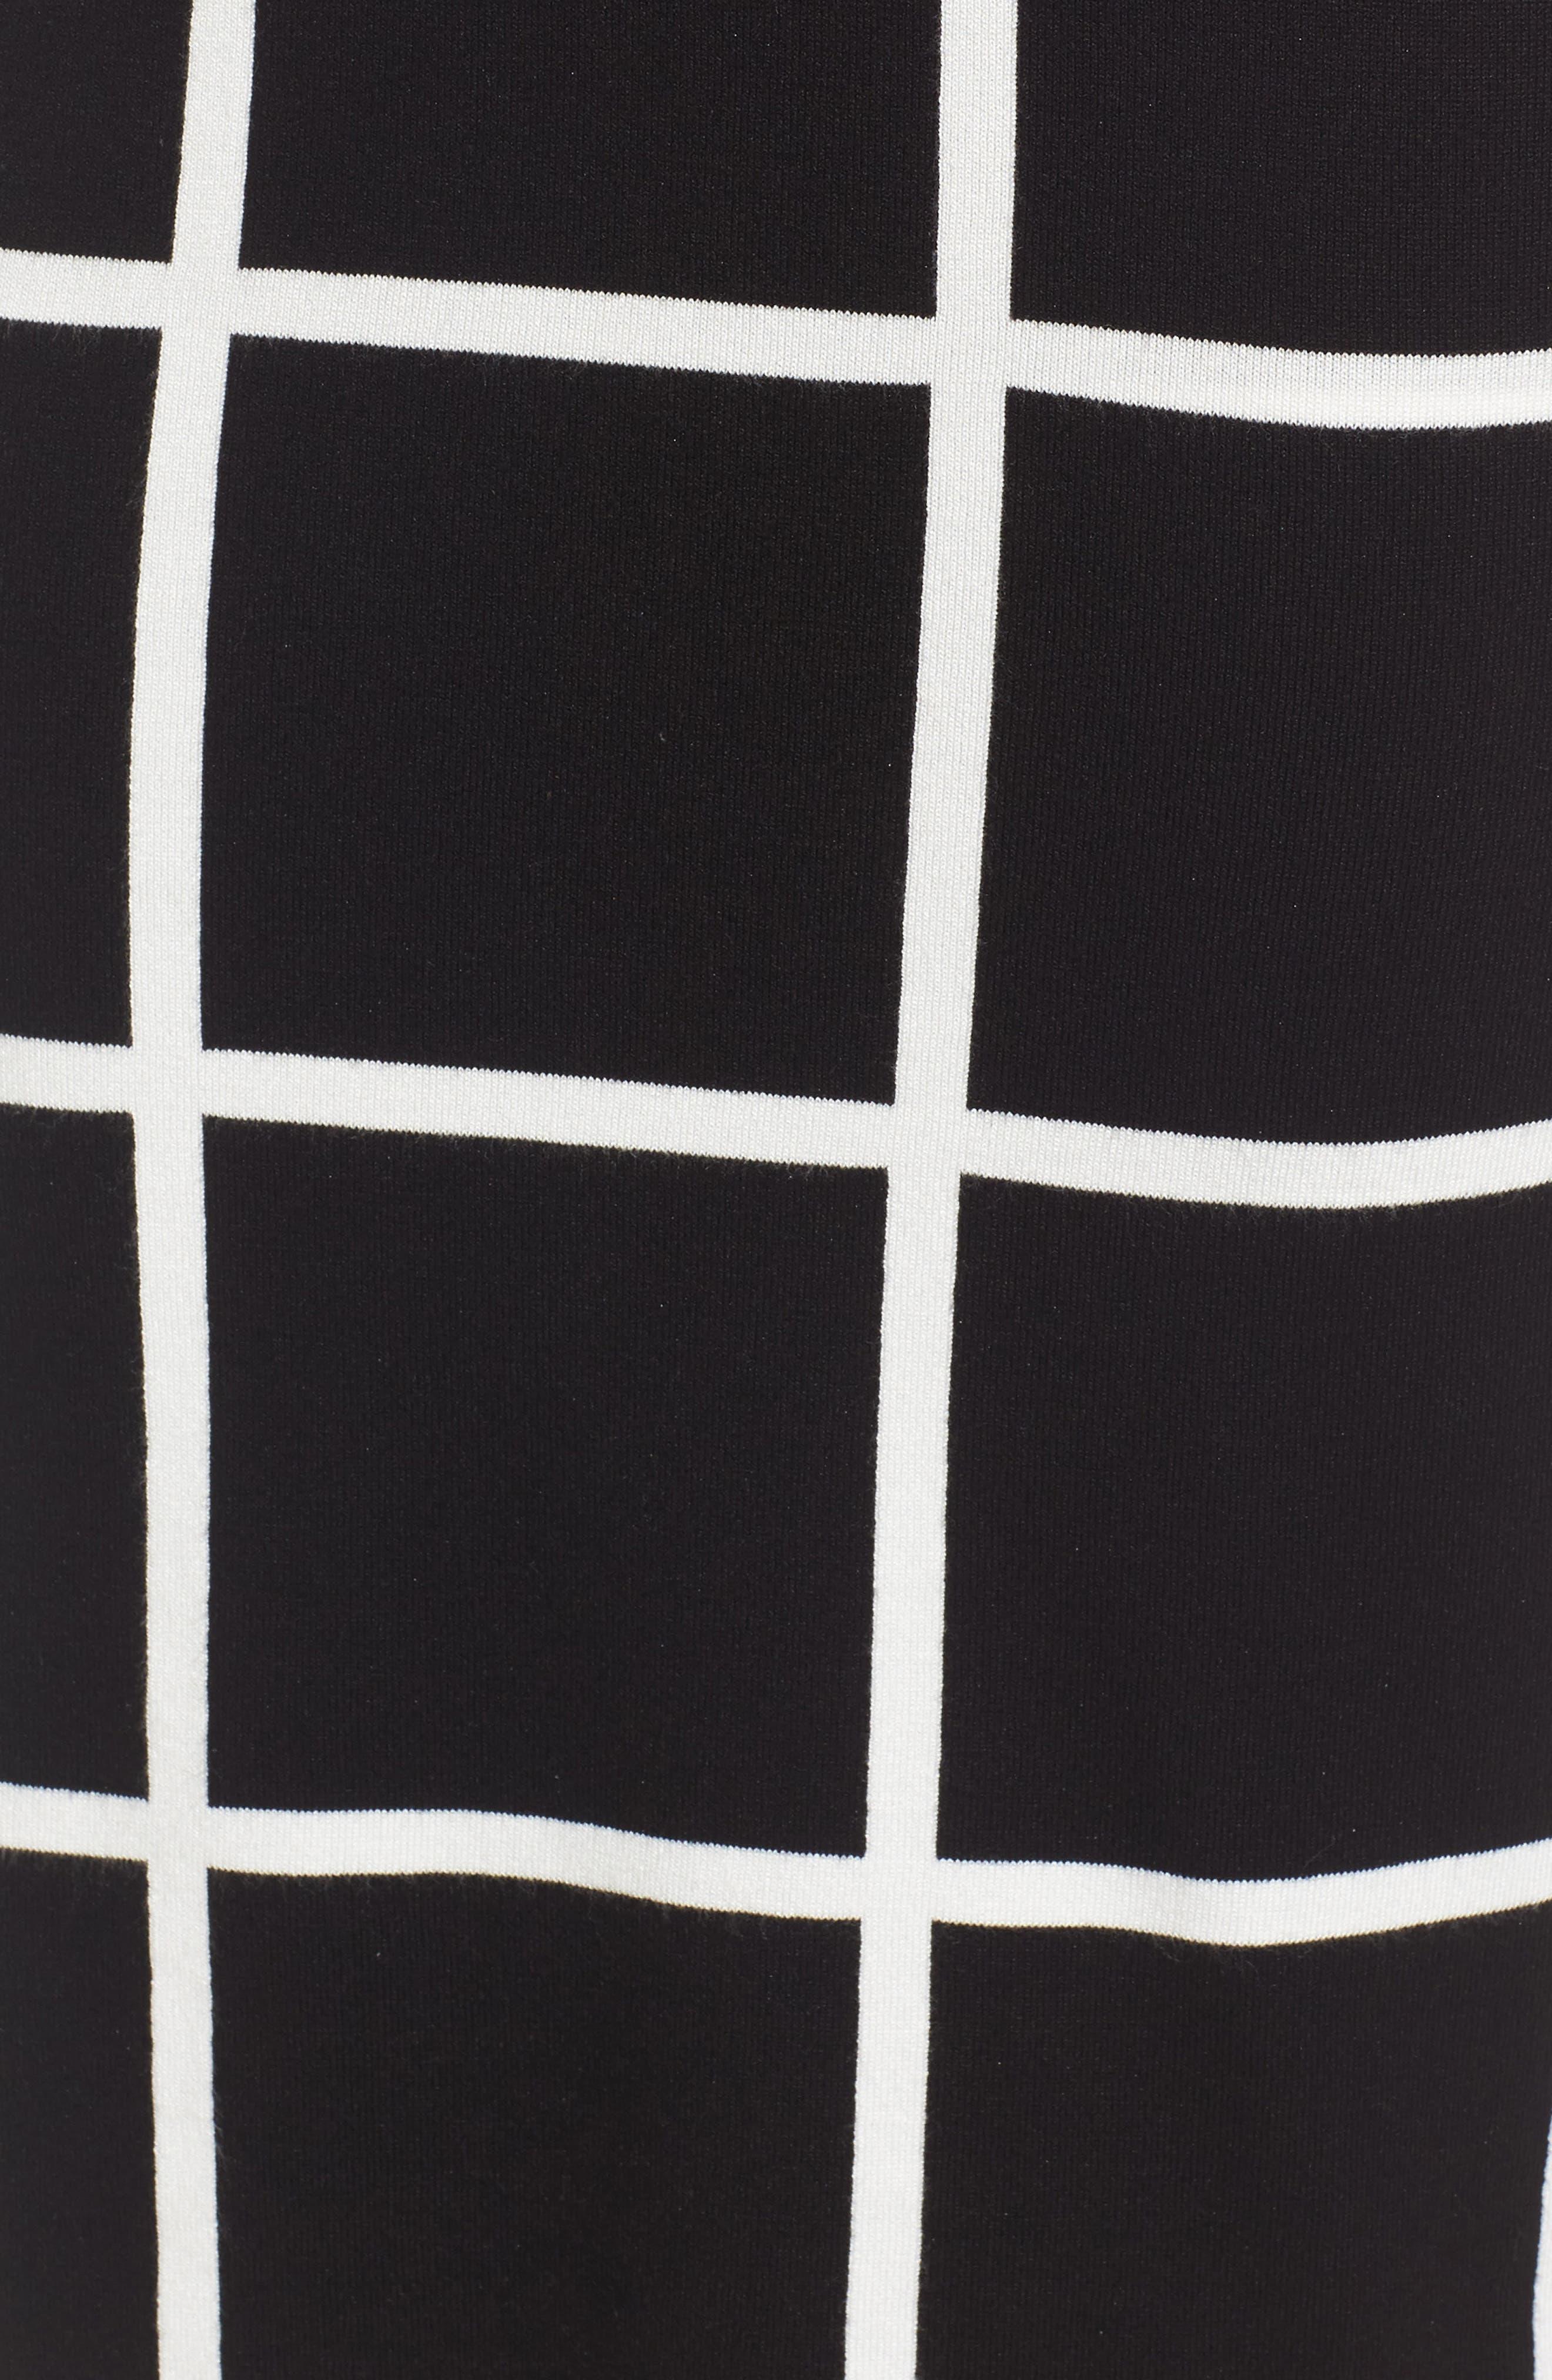 VINCE CAMUTO, Windowpane Sweater Knit Skirt, Alternate thumbnail 5, color, 006